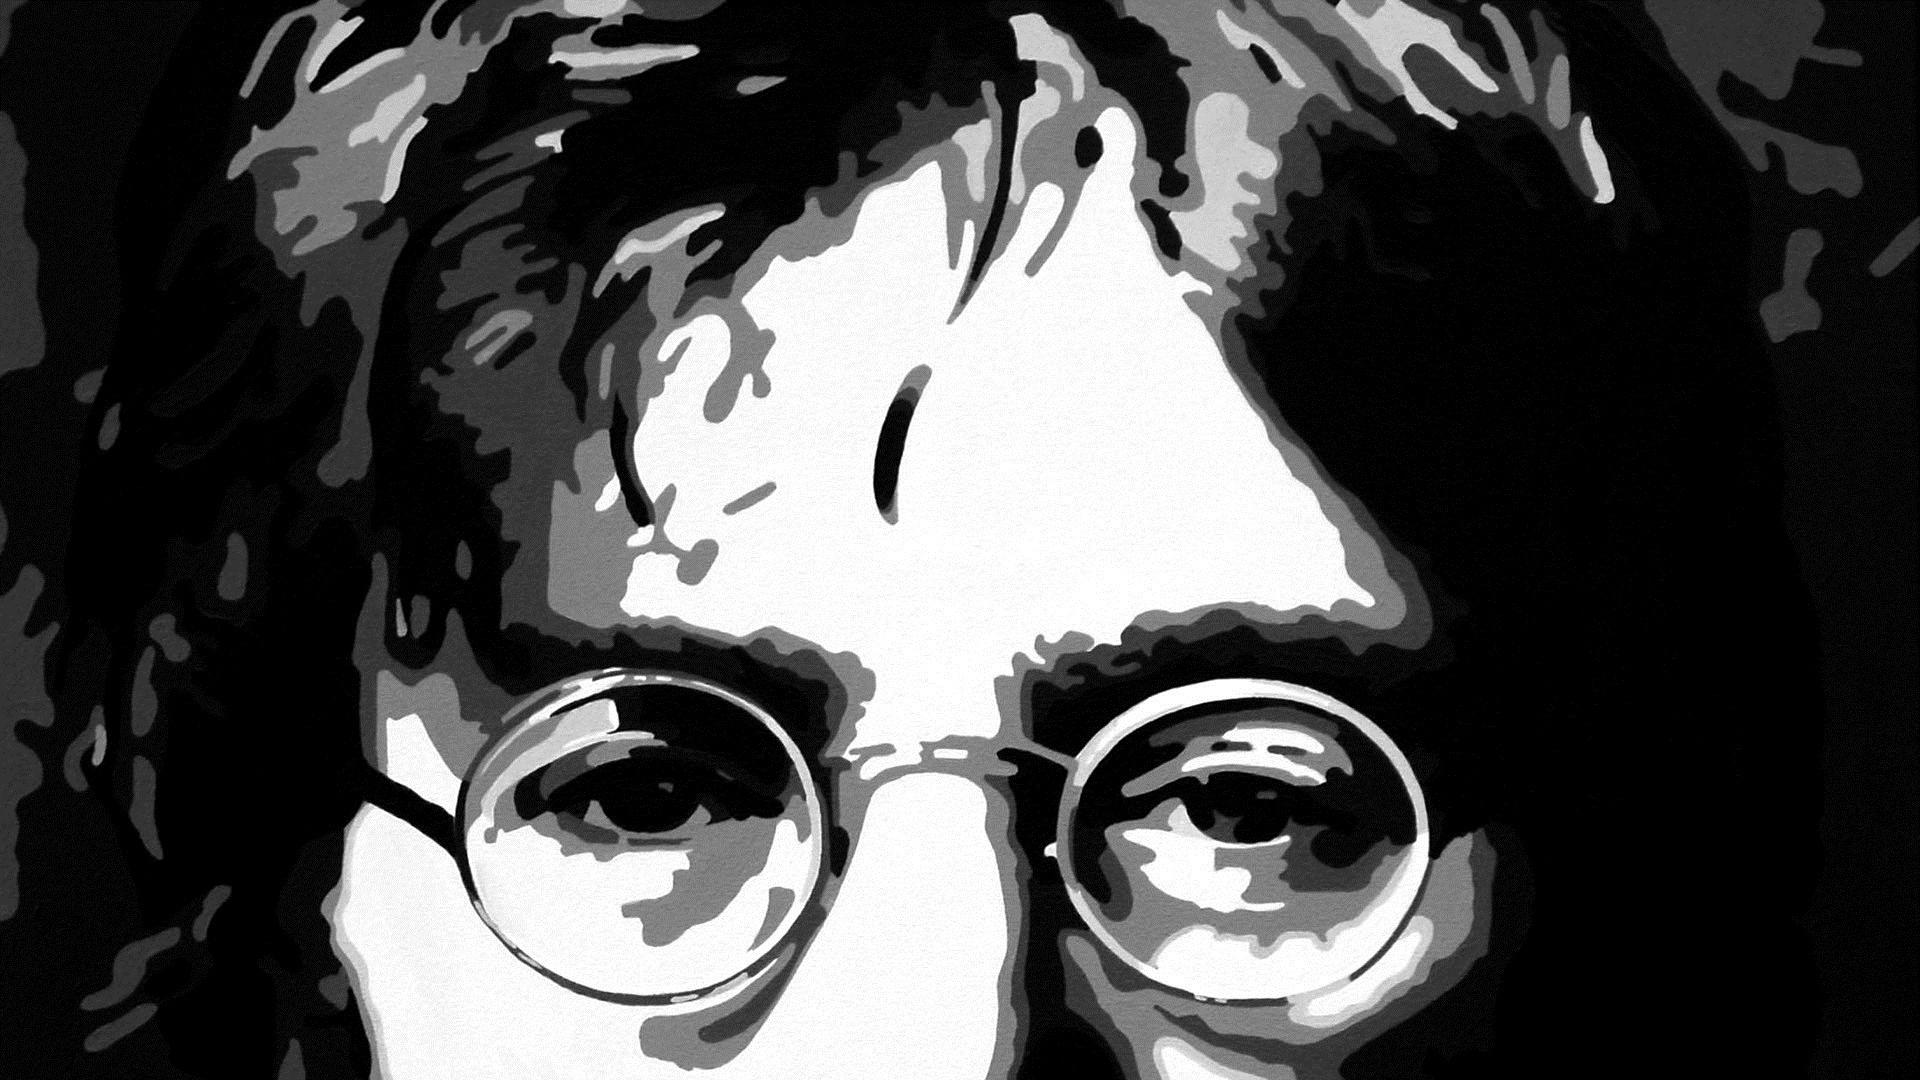 John Lennon Free Download Wallpaper